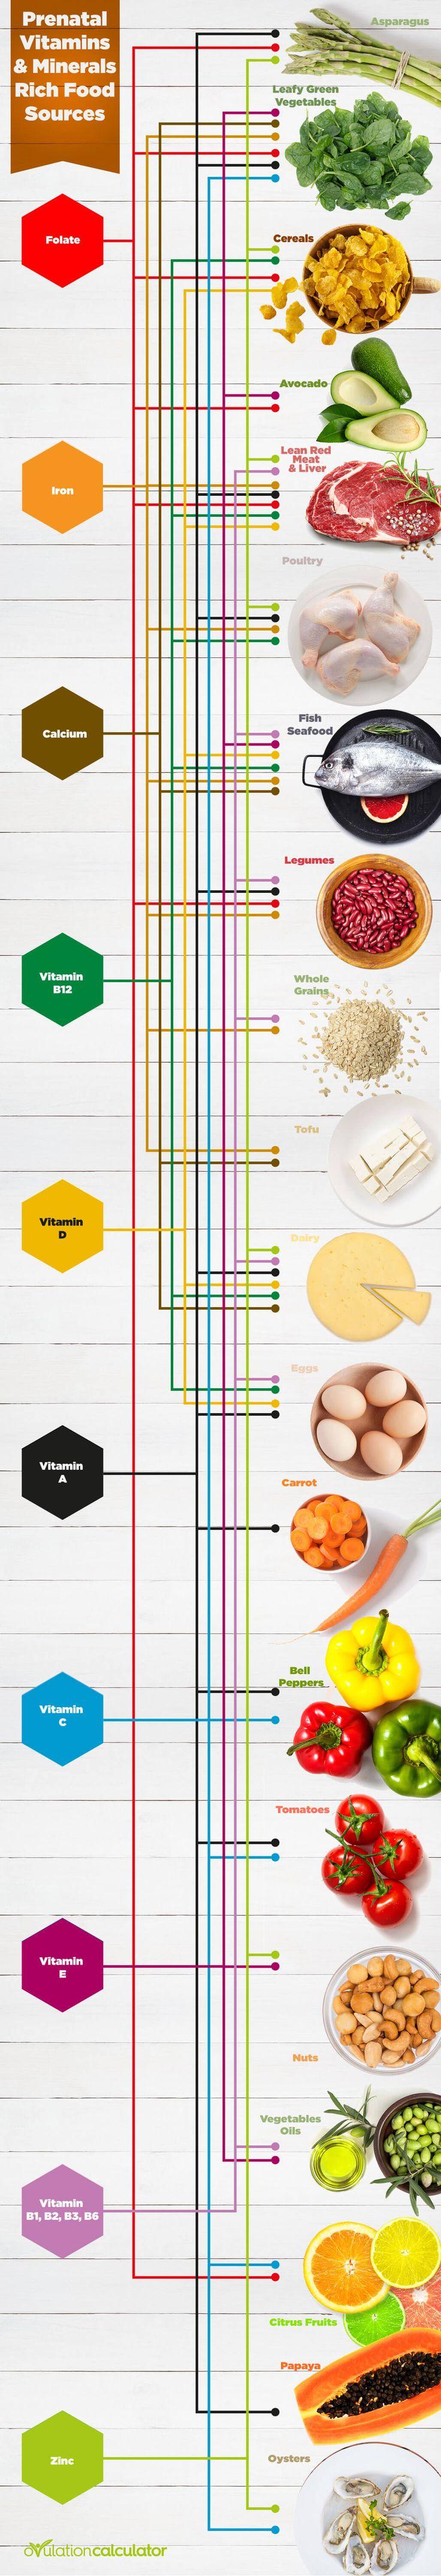 #Prenatal #Vitamins & Minerals Rich Food Sources #Infographic